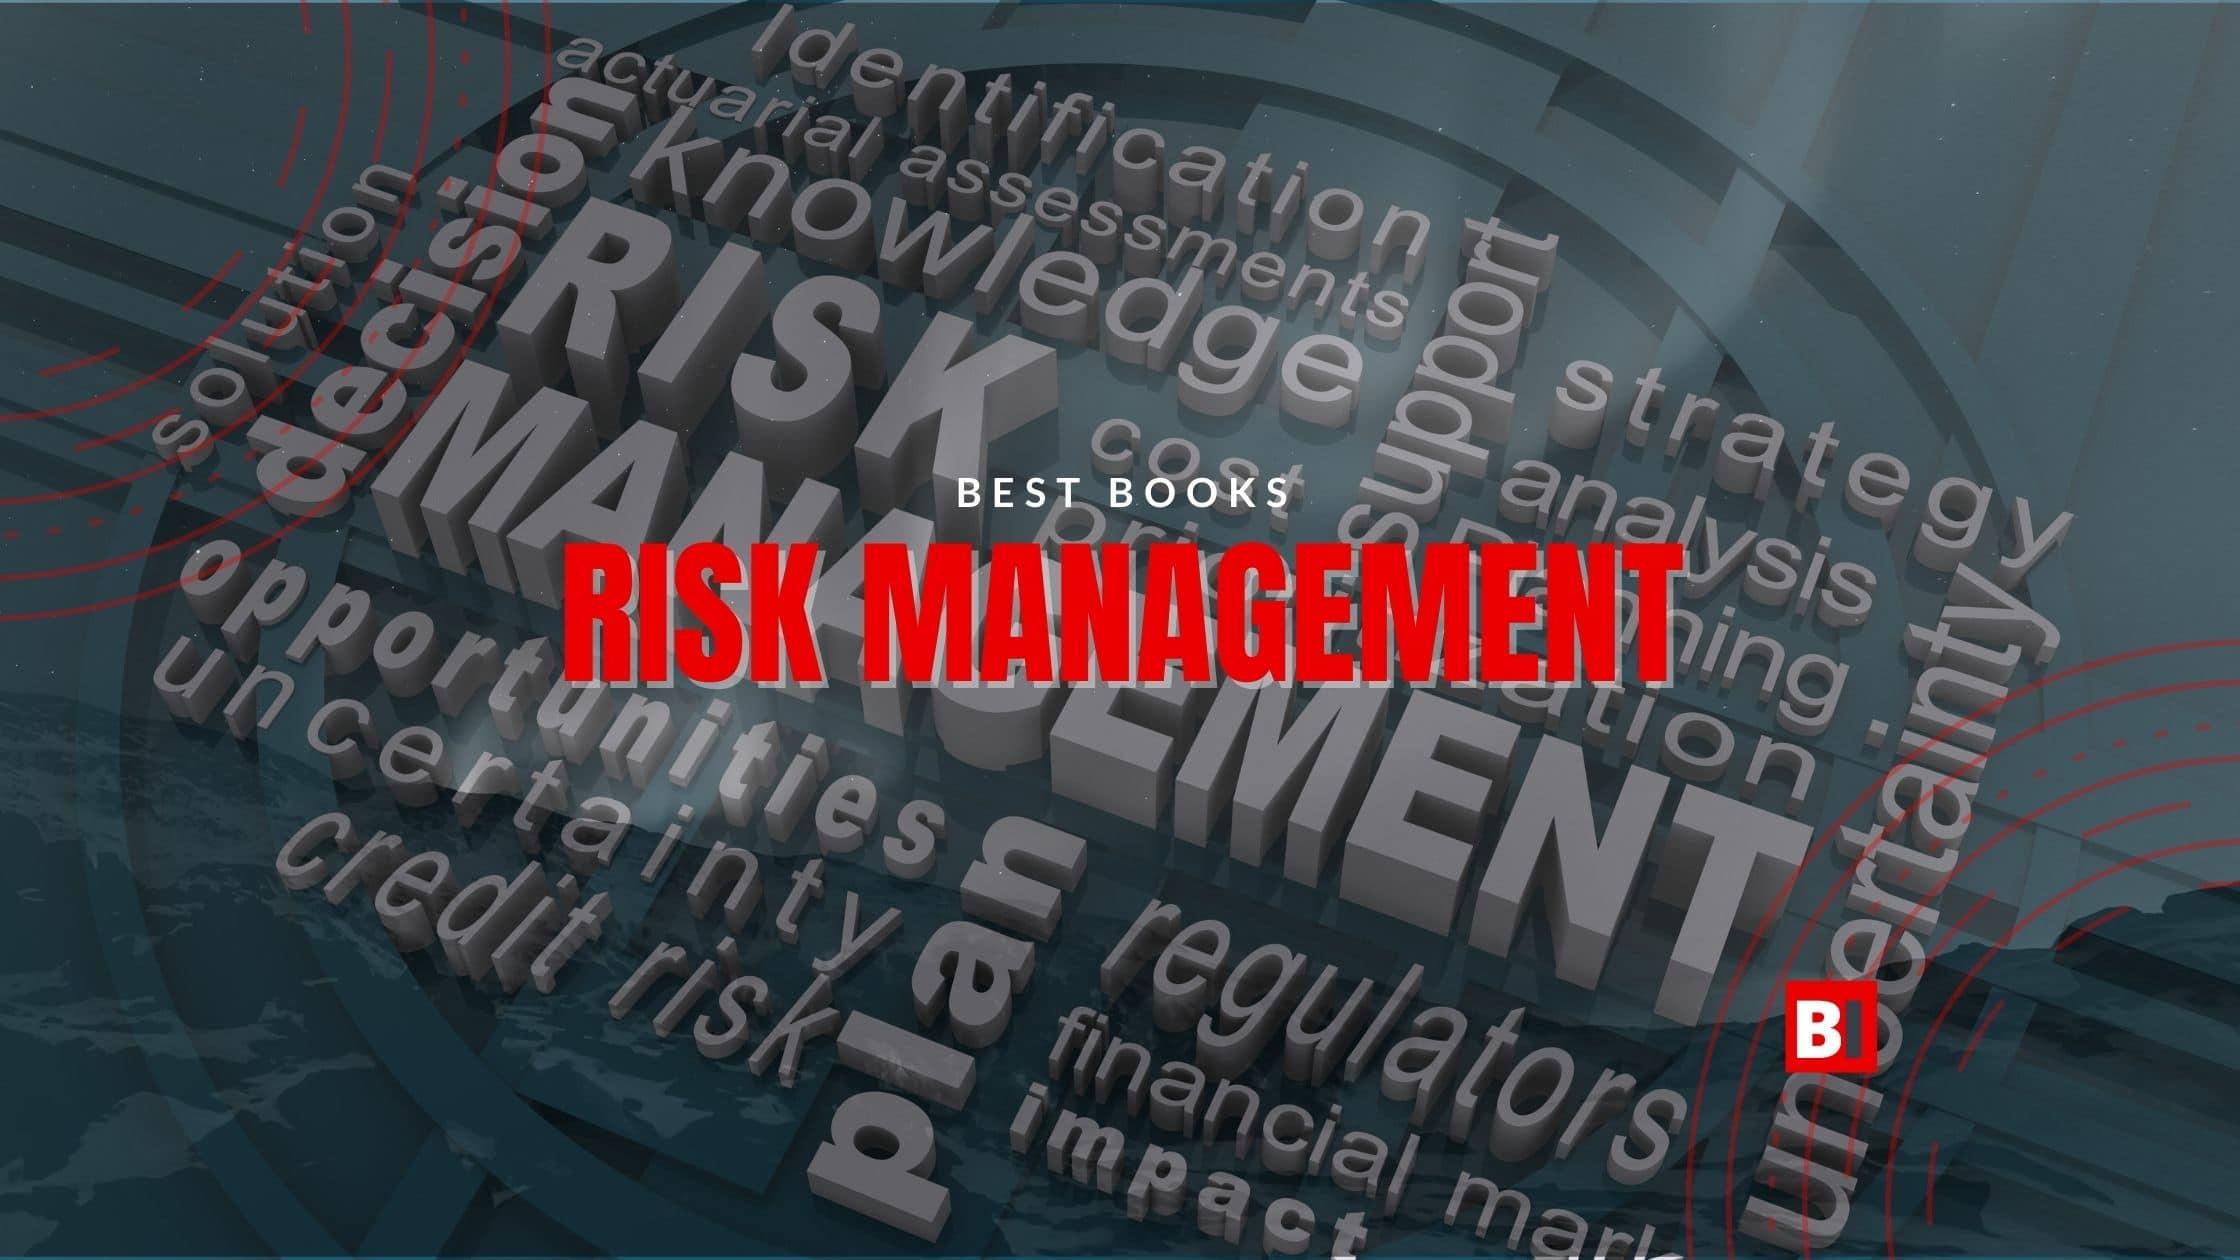 Best Books on Risk Management